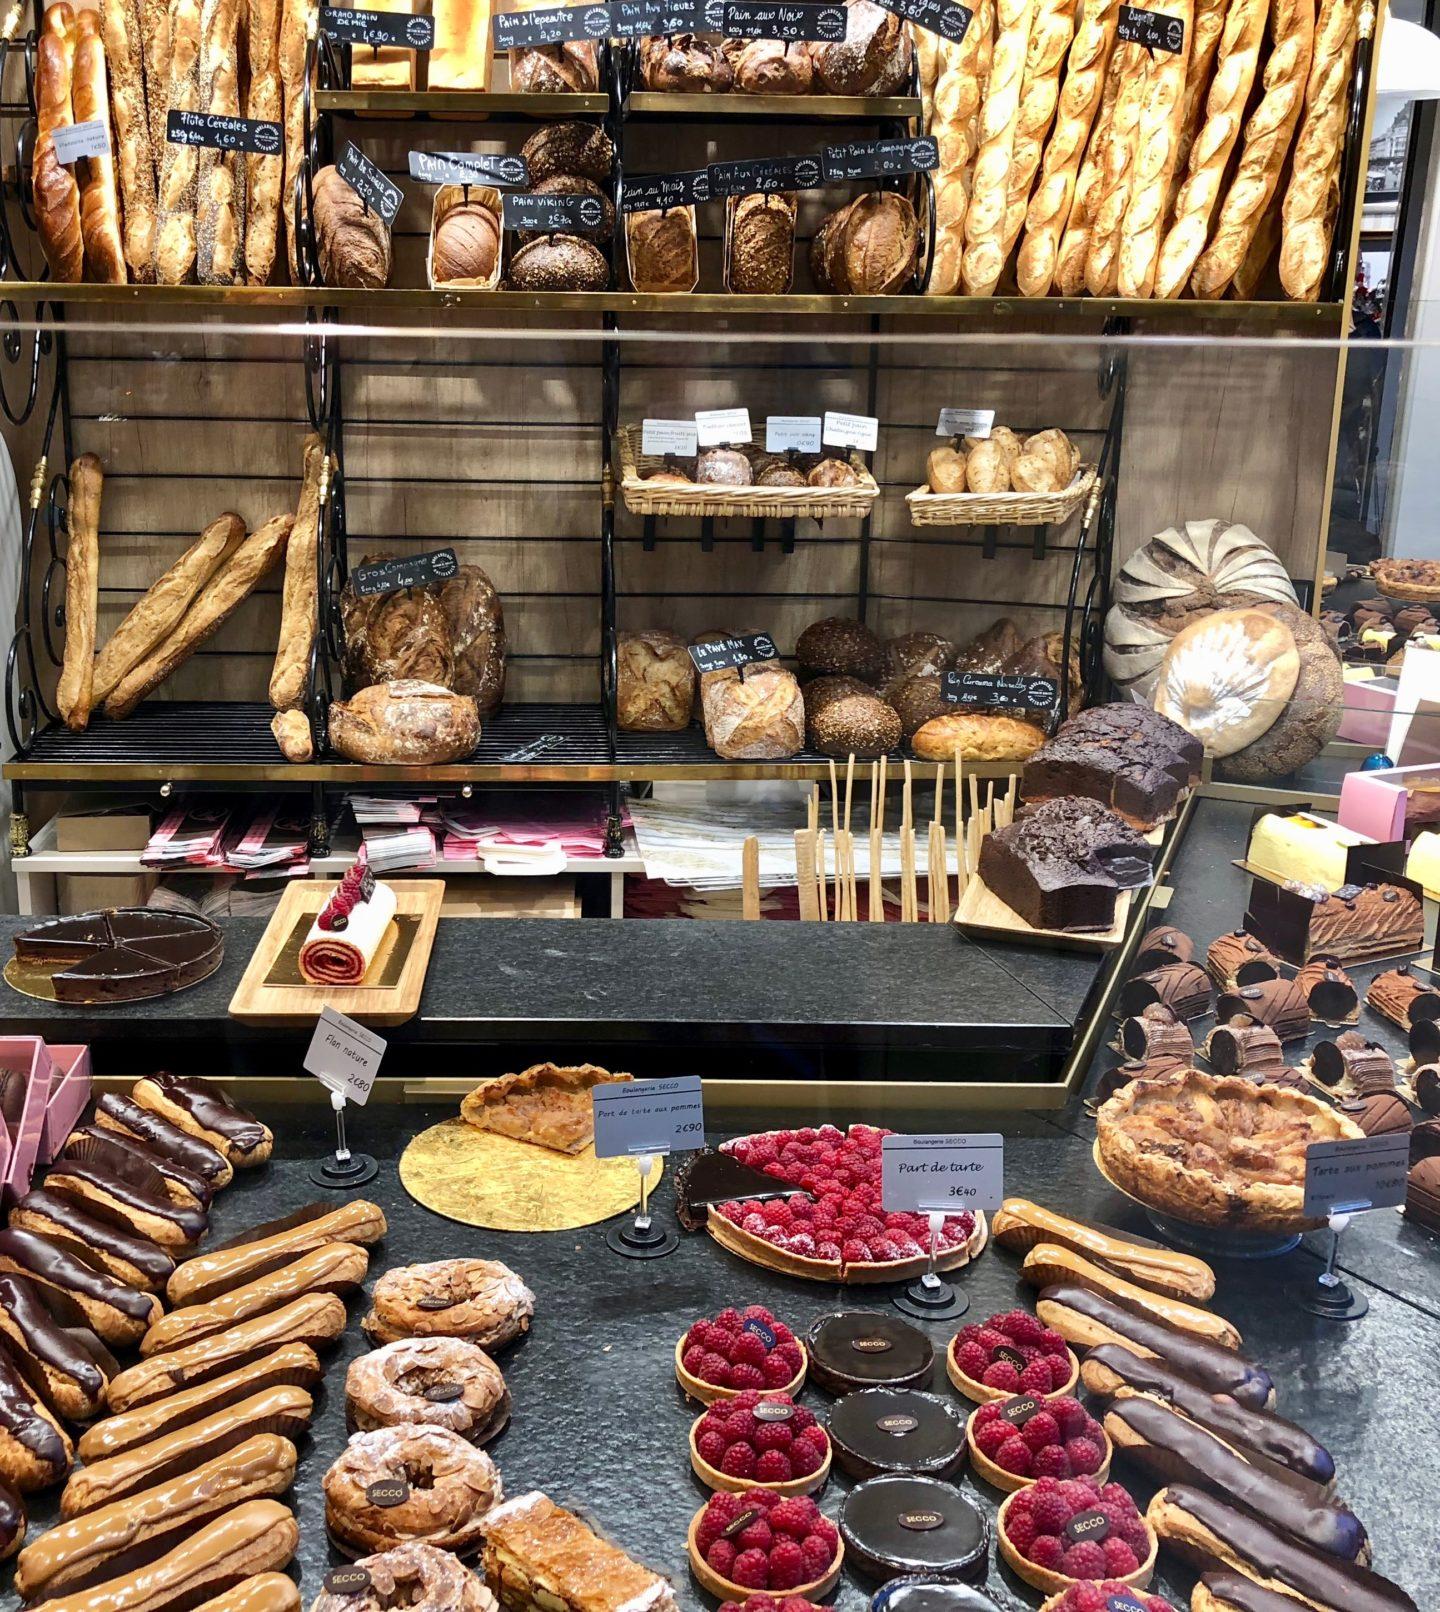 Pairs Boulangerie/Patisserie